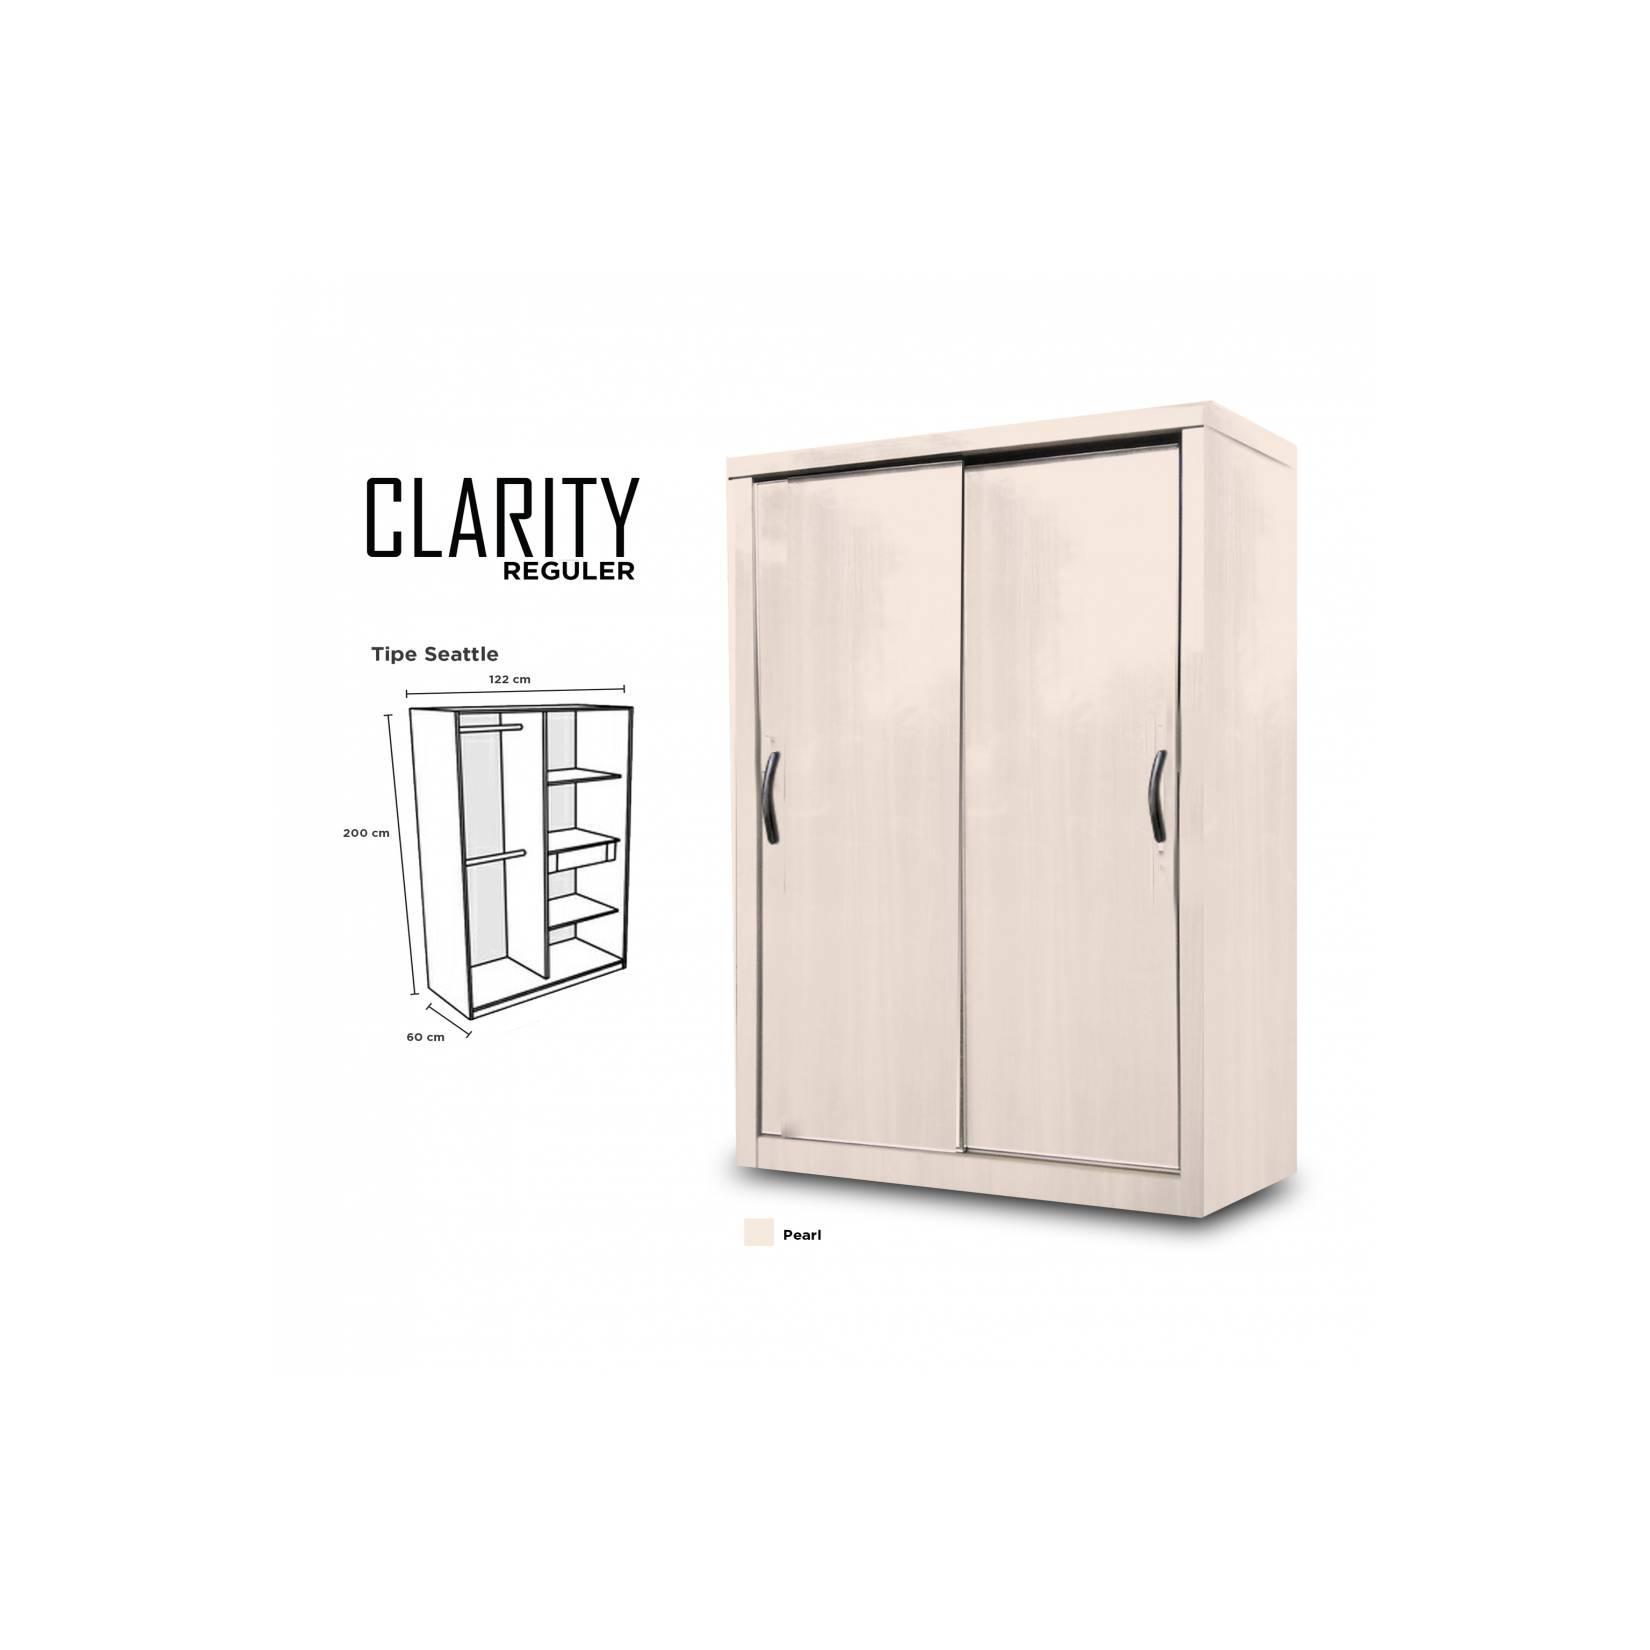 Lemari Pakaian 2 Pintu Minimalis Clarity Door Sliding HPL Putih Pearl